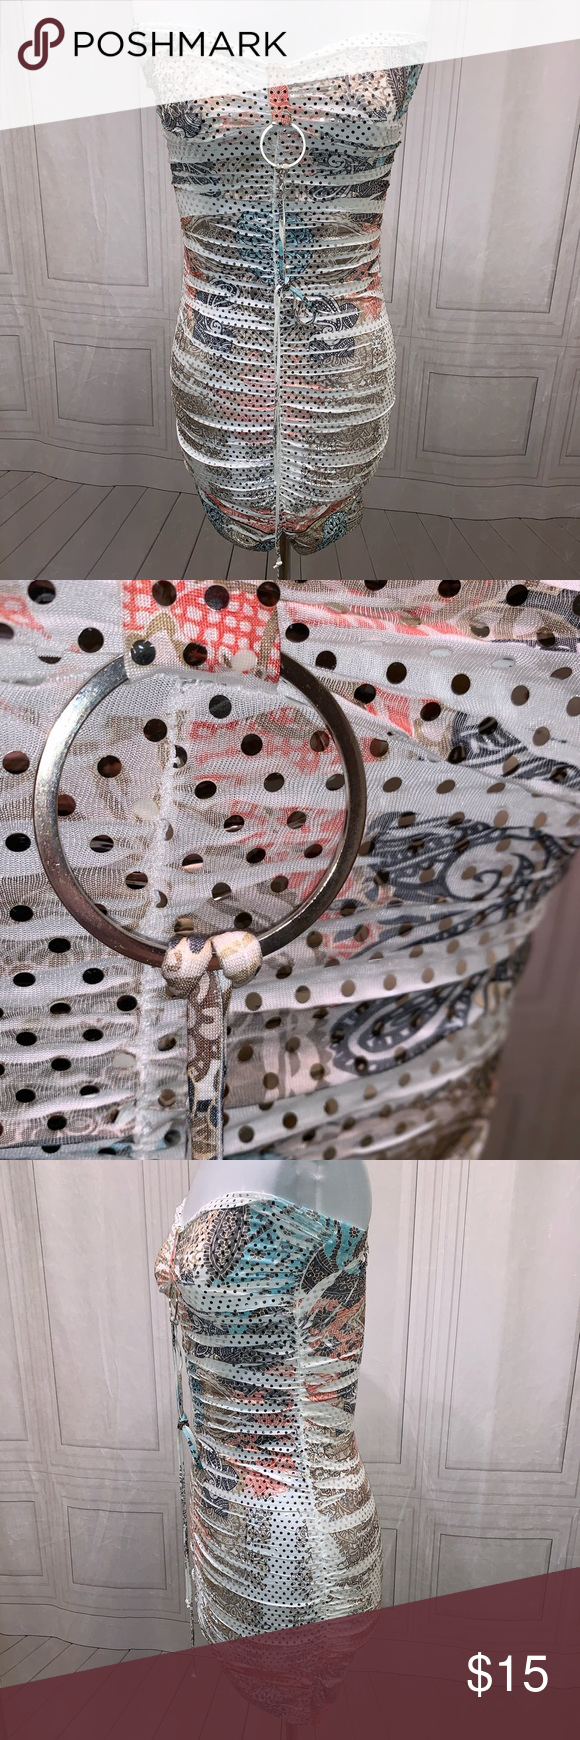 Body Central Tube Top Design Mini Skirt/Top Shirt Body Central Dresses Mini #tubetopoutfits